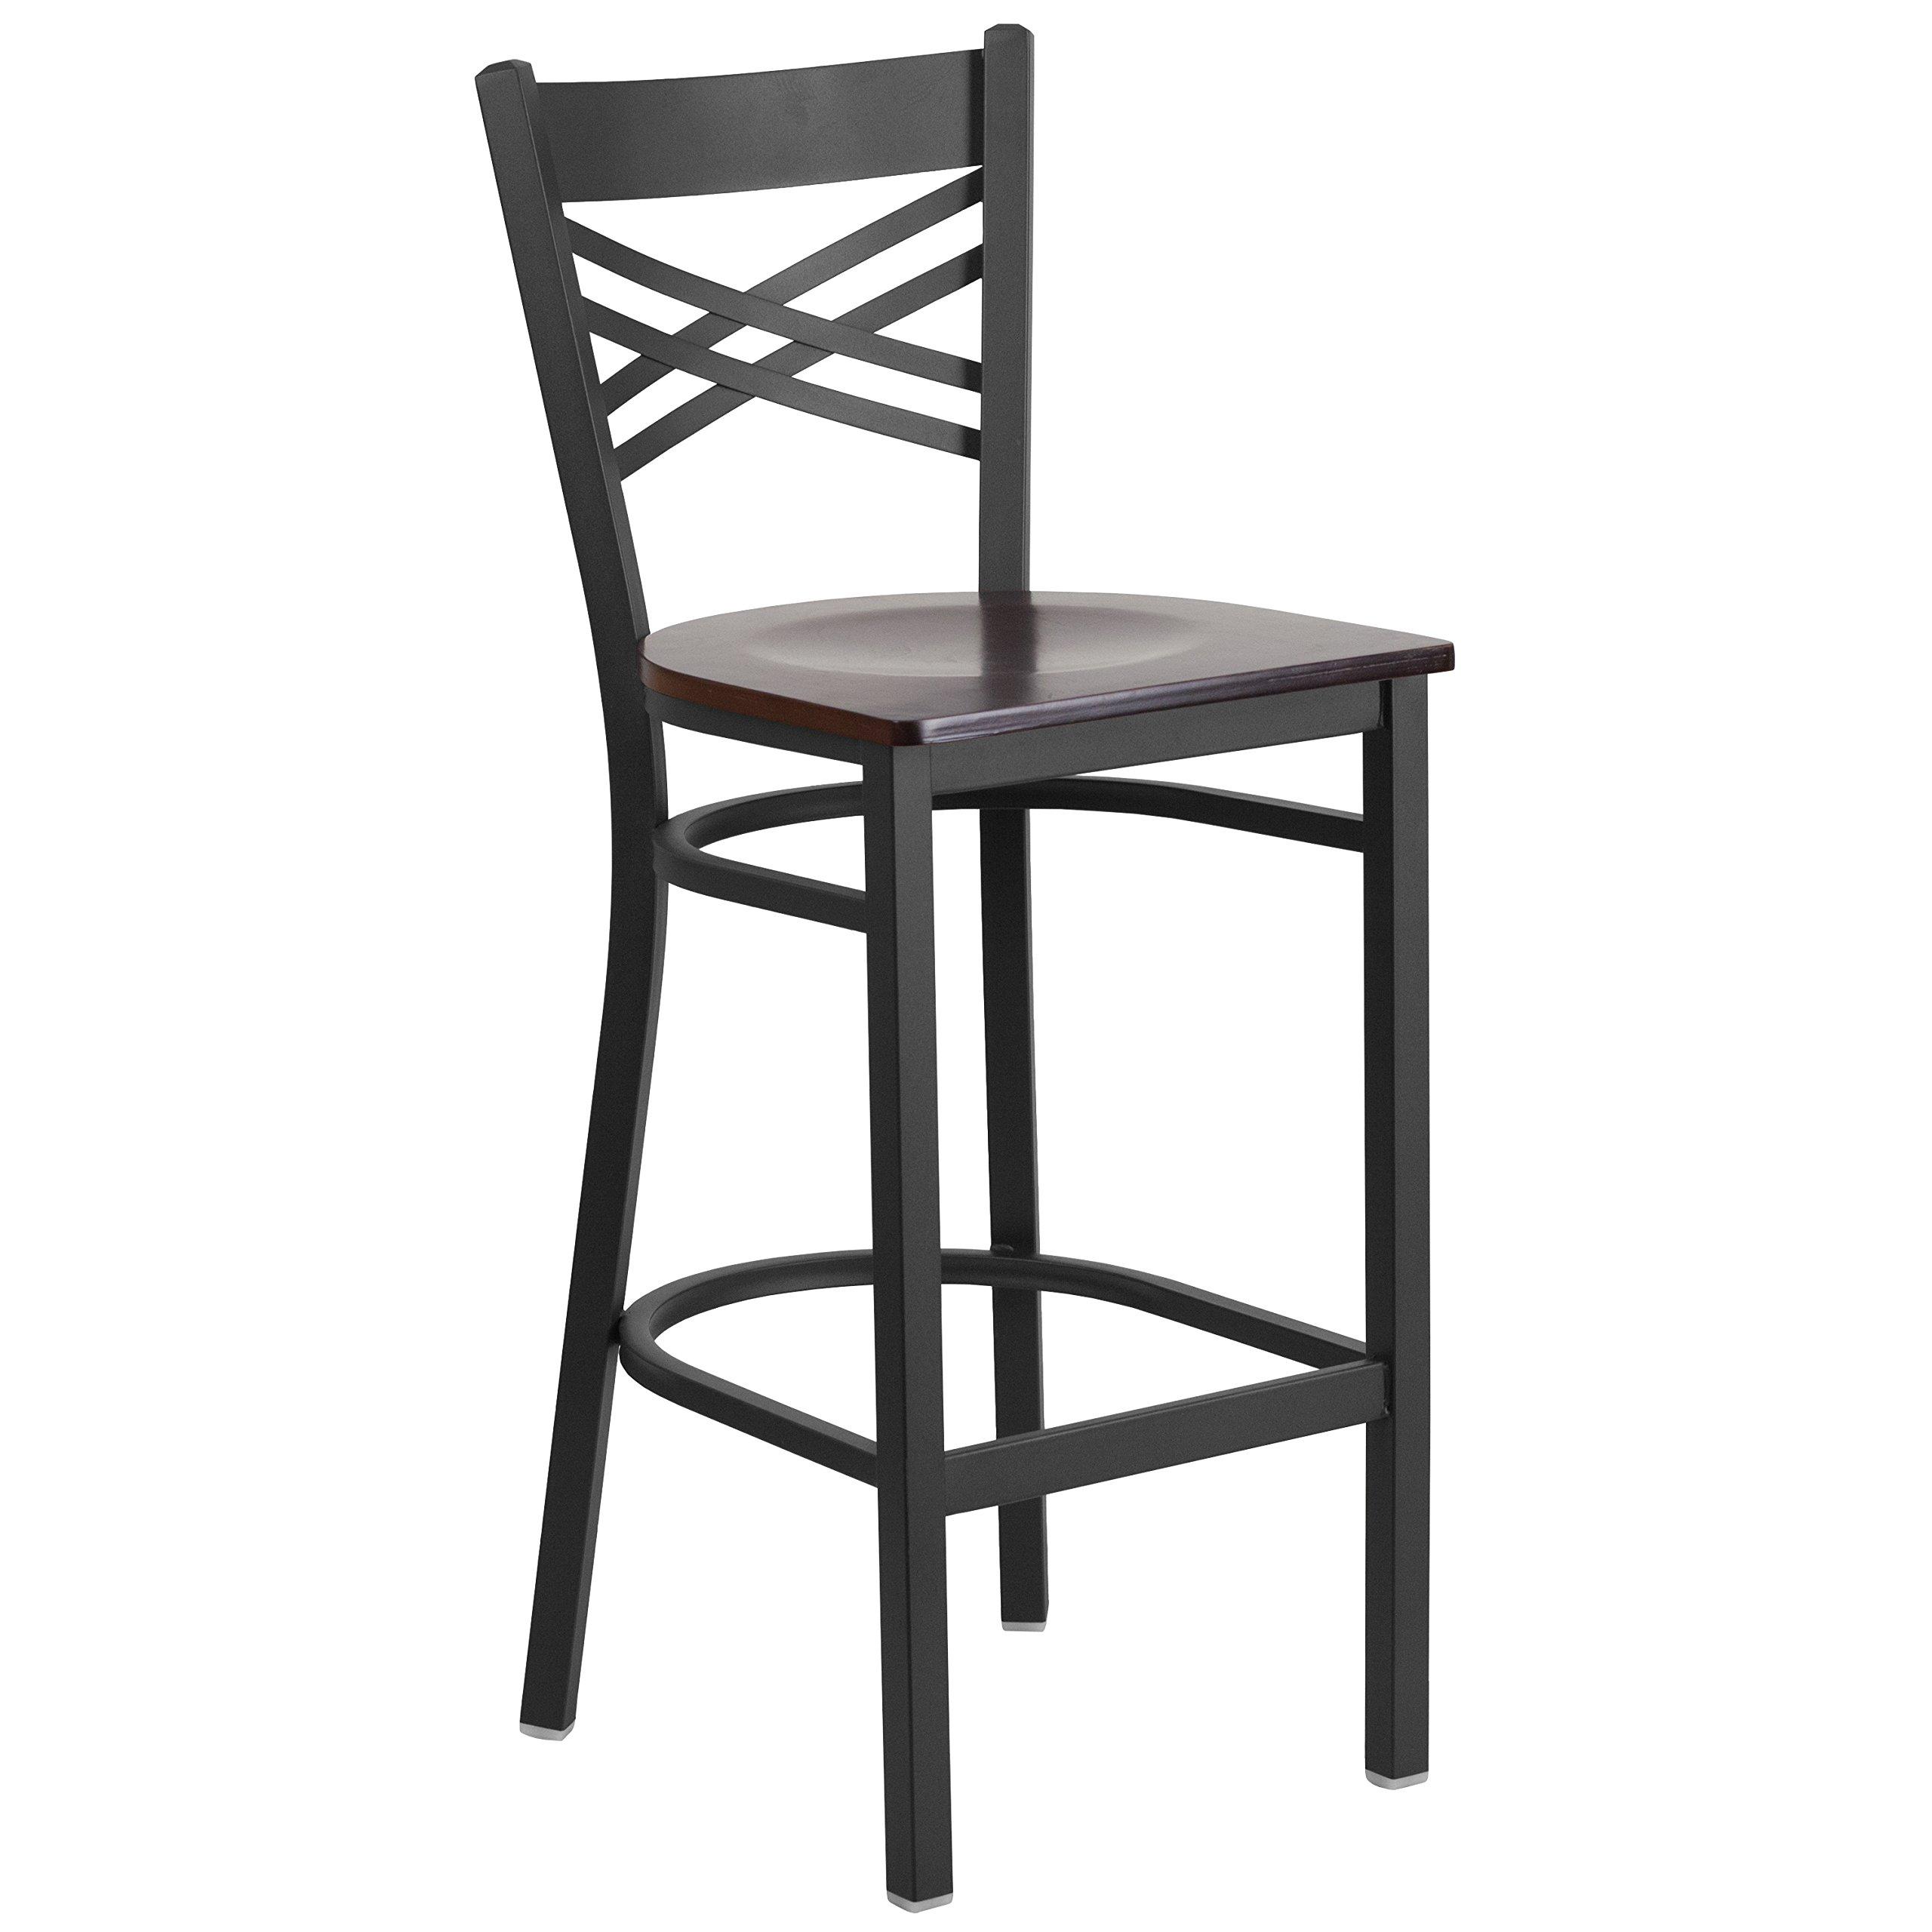 Flash Furniture HERCULES Series Black ''X'' Back Metal Restaurant Barstool - Walnut Wood Seat